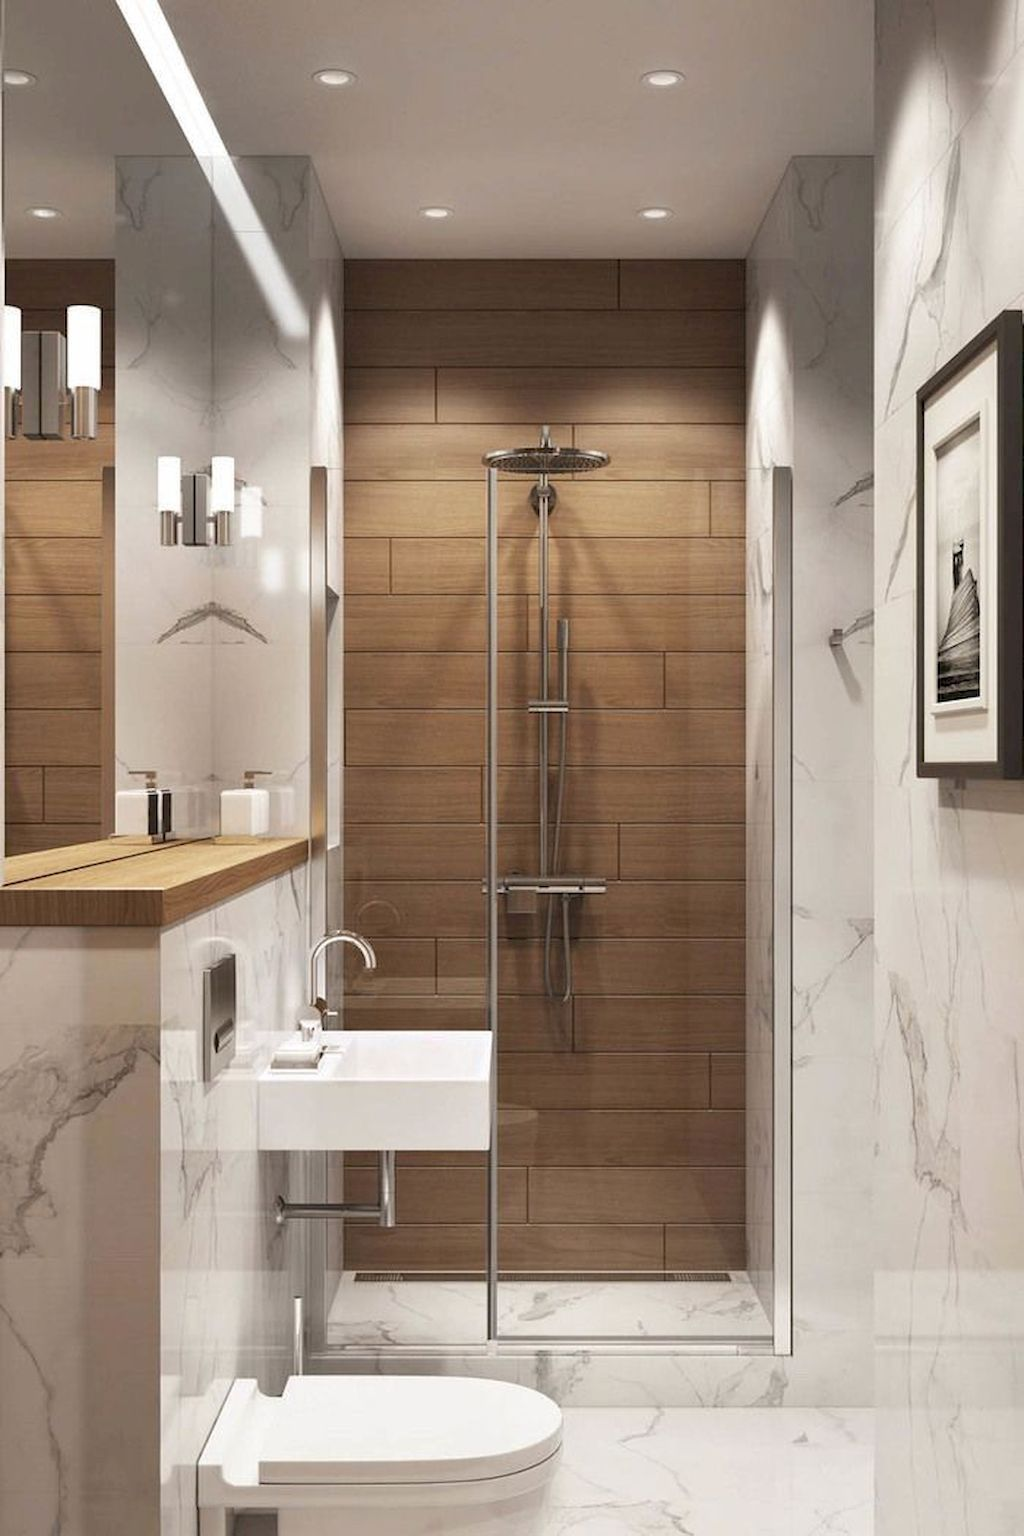 Best bathroom layout design ideas inspiration pinterest and also rh